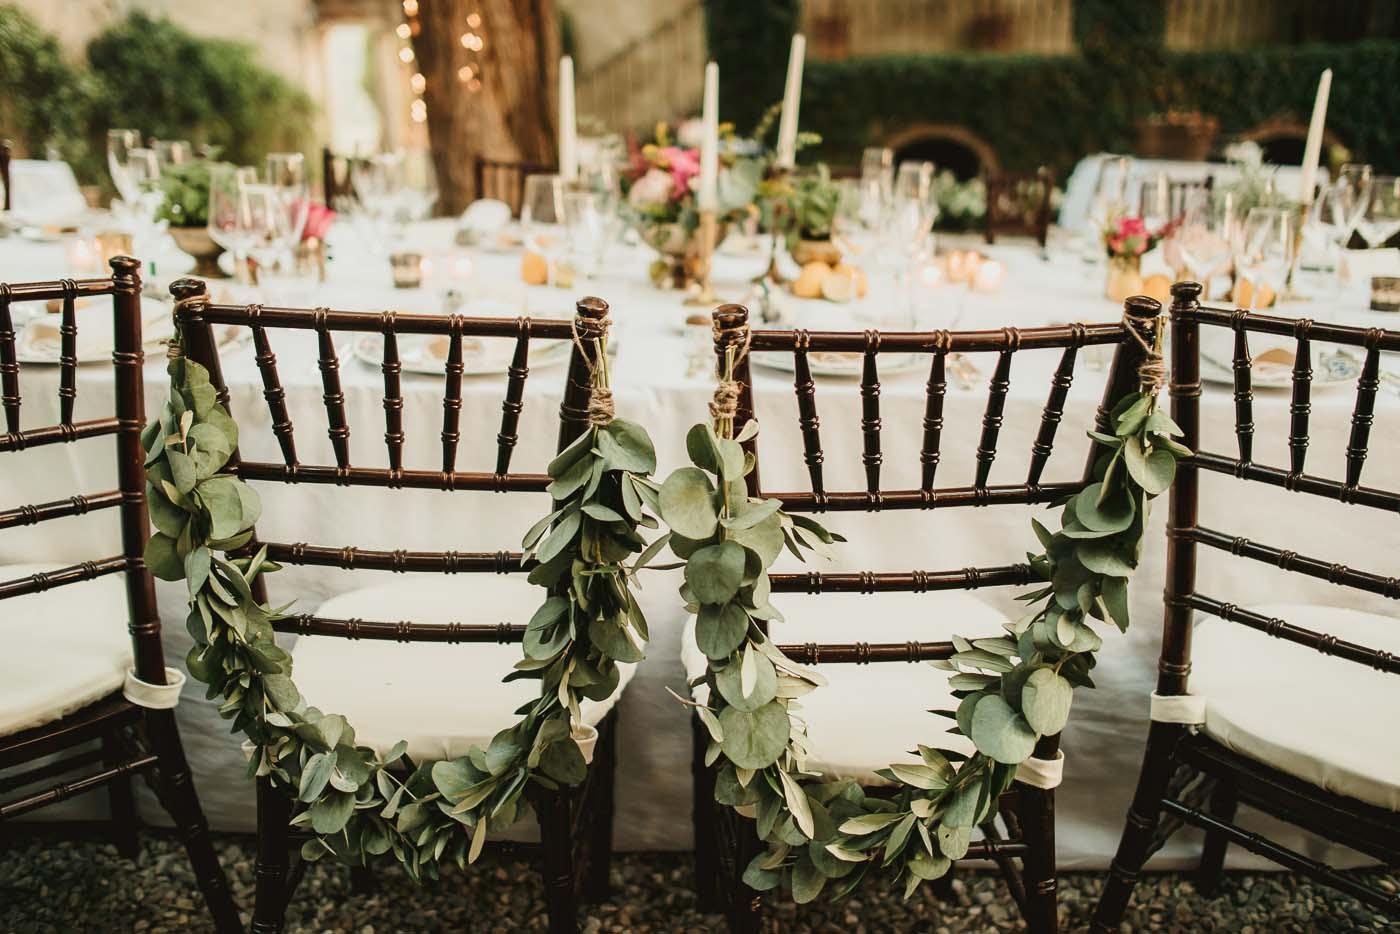 Relaxed-wedding-borgo-stomennano-1188